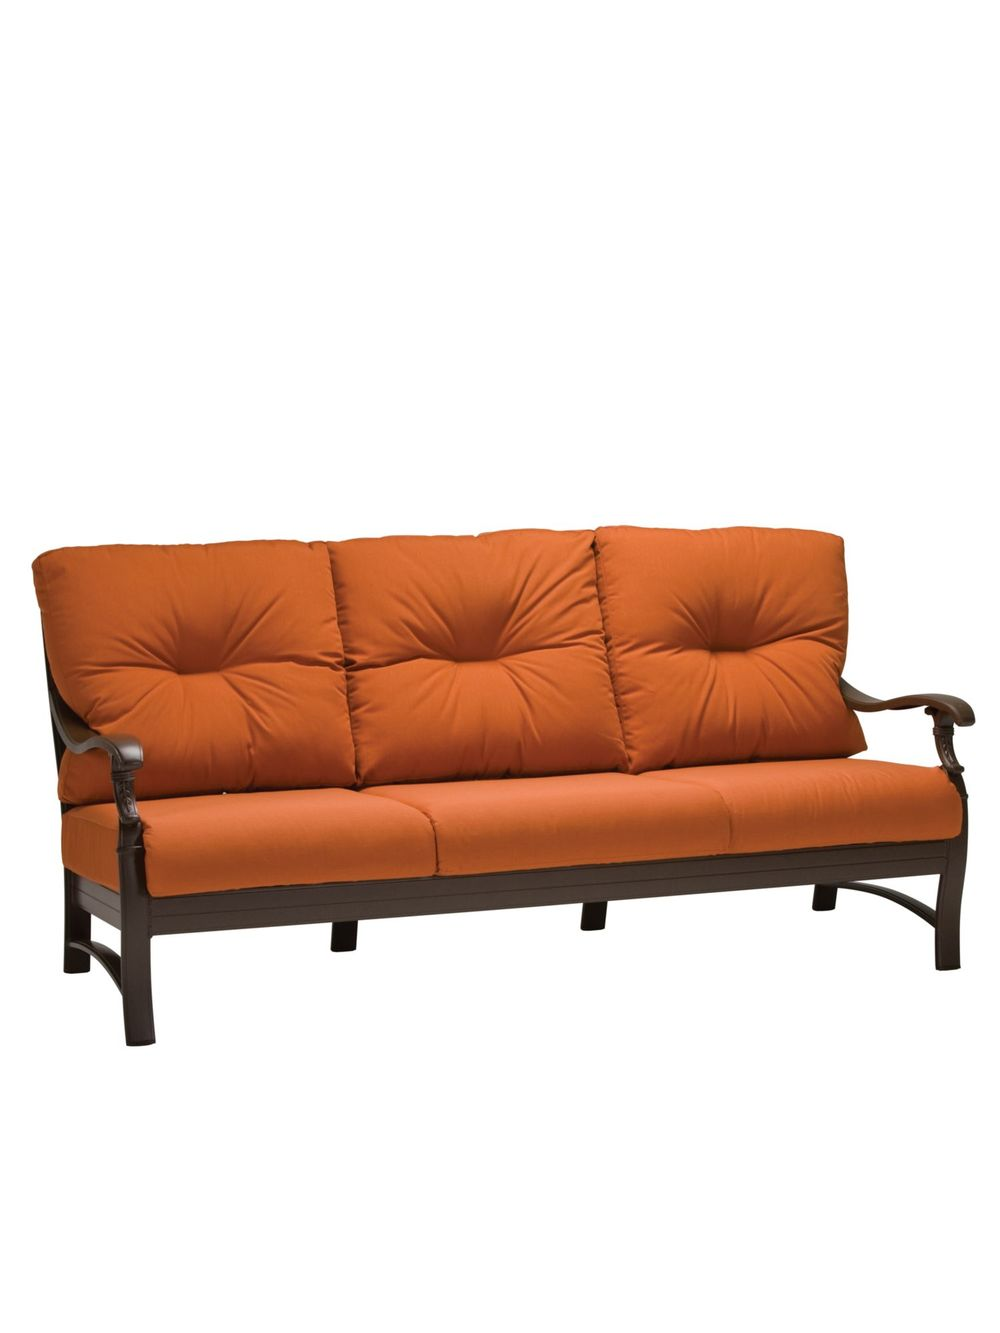 Tropitone Furniture - Sofa